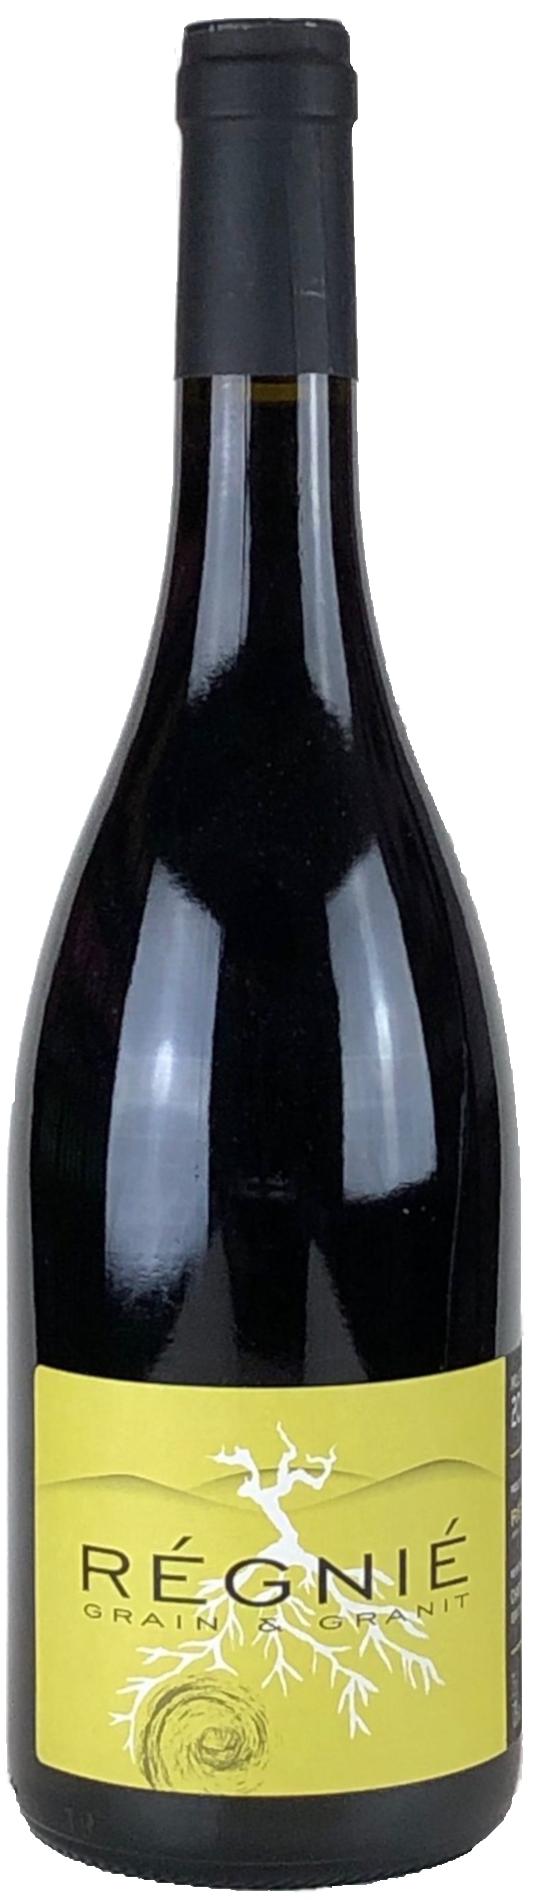 Thévenet, Charly - Beaujolais 2018 Régnié AOP Grain & Granit, Charly Thevenet